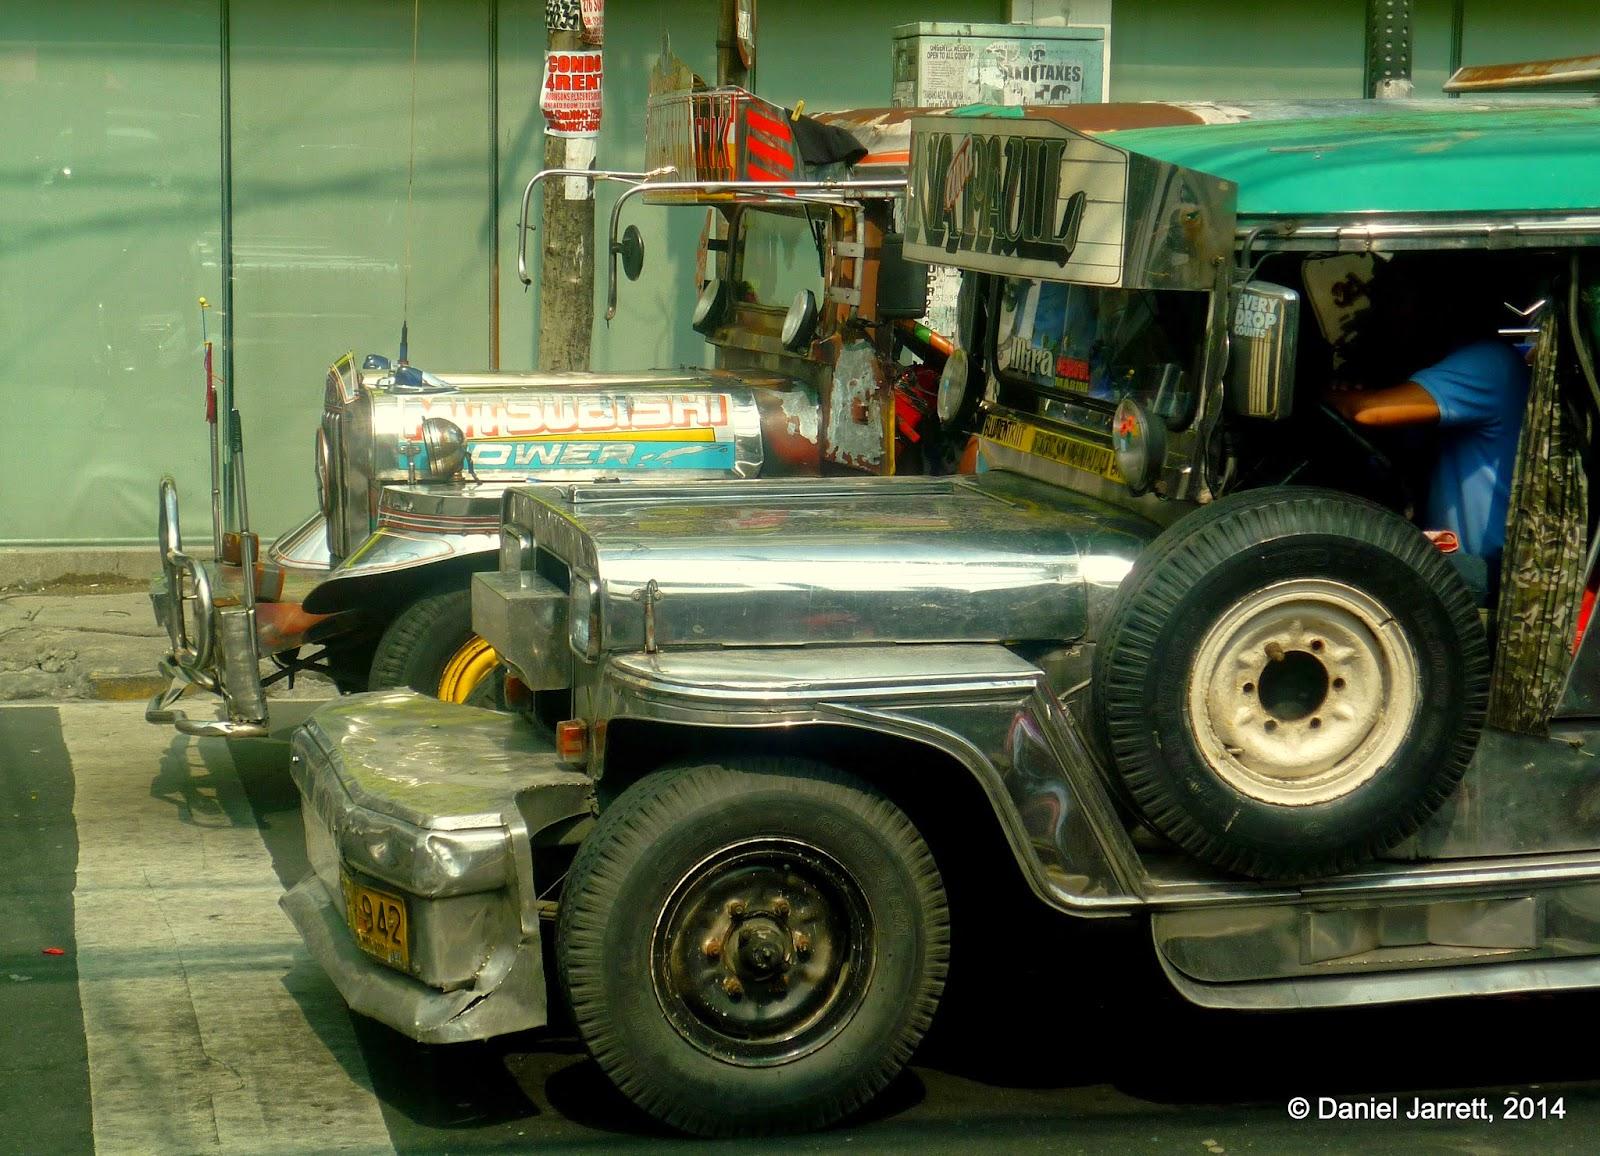 Street life in Manila